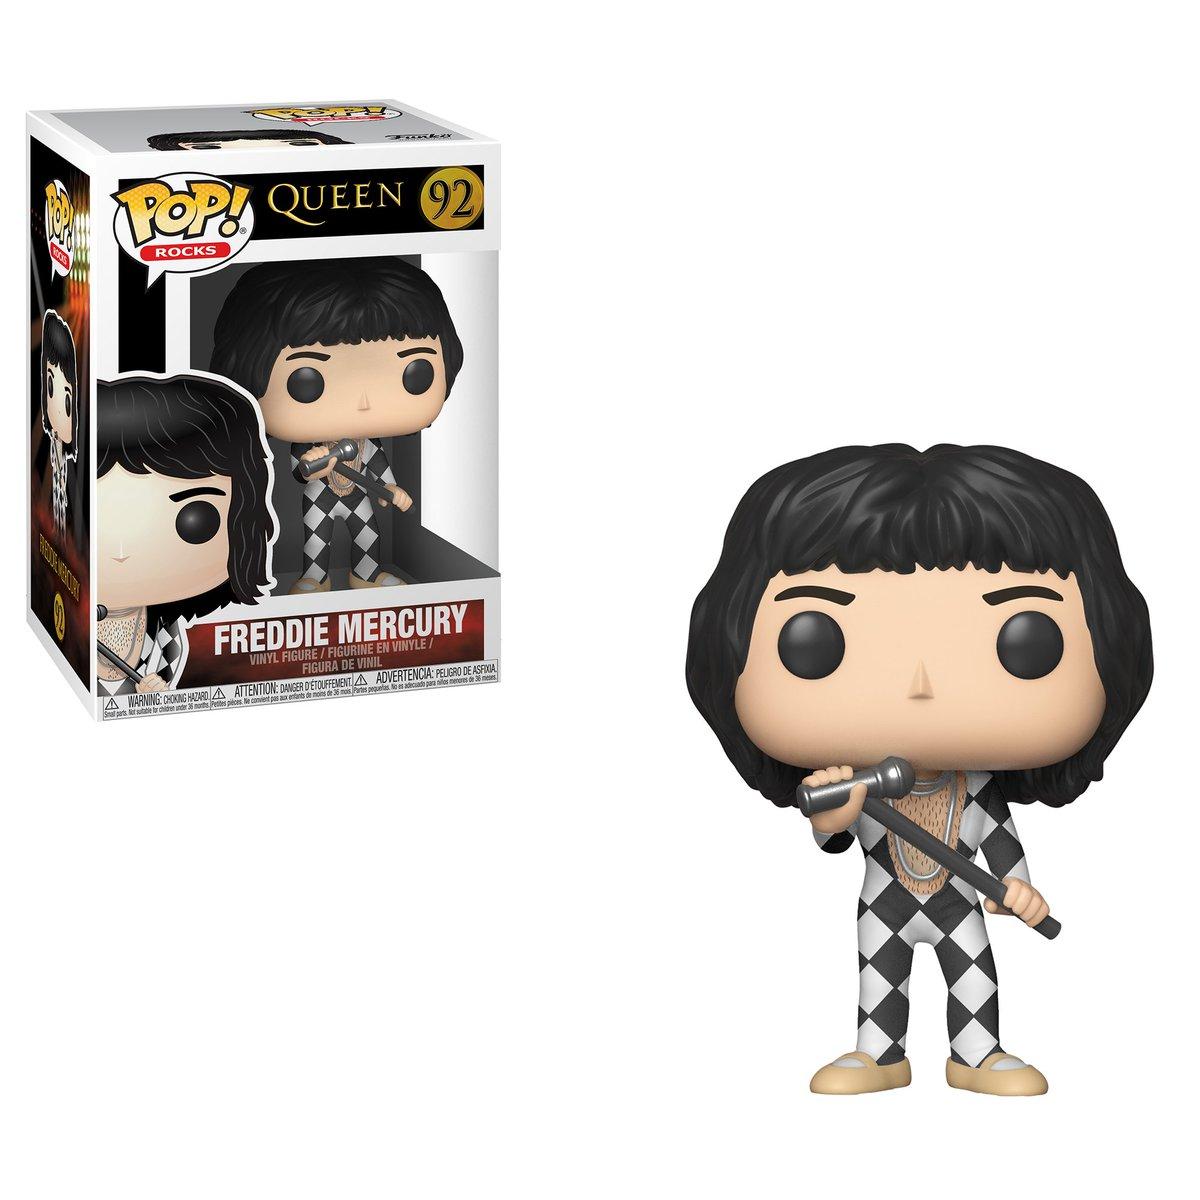 RT @OriginalFunko: RT & follow @OriginalFunko for the chance to win a Freddie Mercury Pop! https://t.co/Ryu6RU1c9n